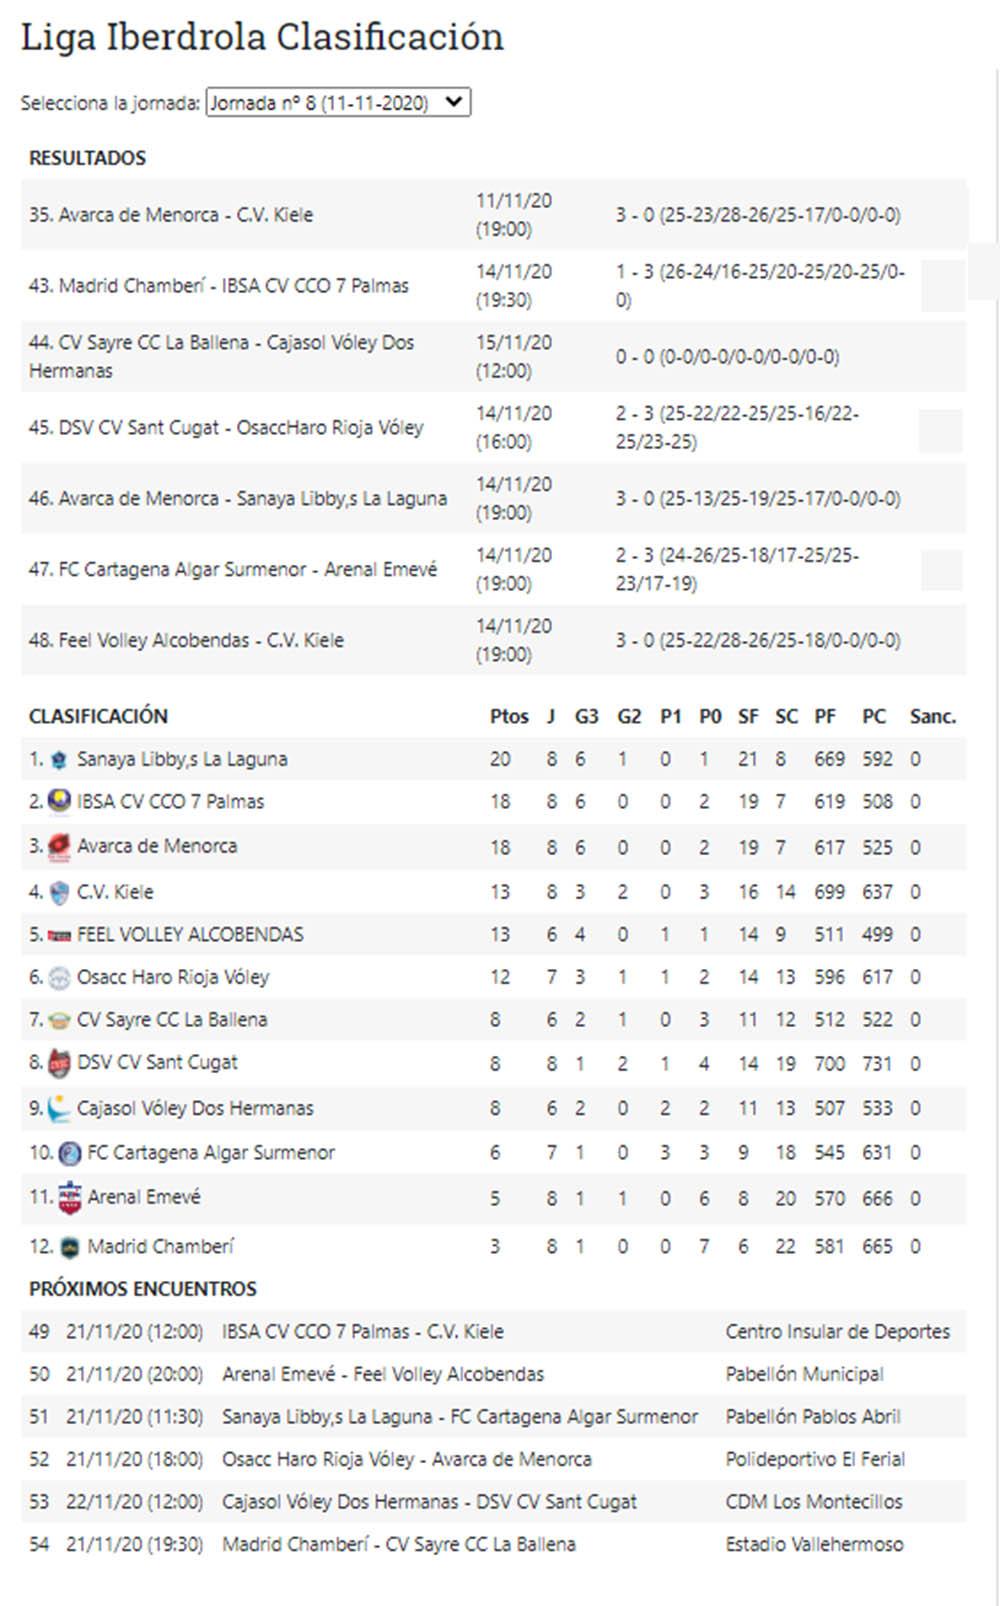 Resultados Superliga Iberdrola